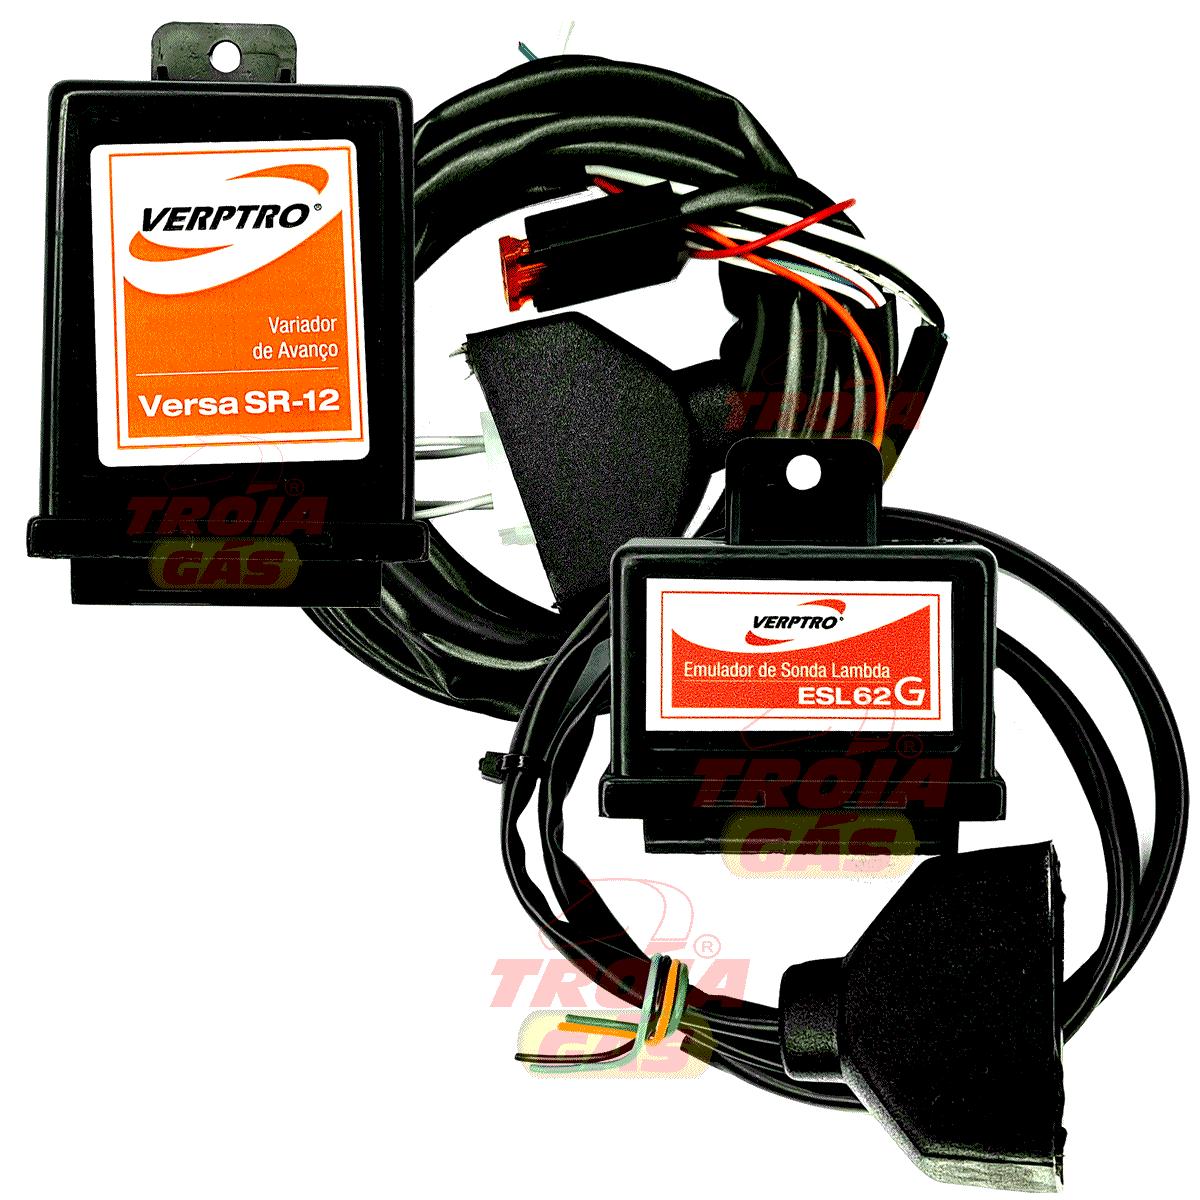 Kit Simulador Sonda Gasolina Variador Sensor Hall Fase Verptro ESL62G SR12